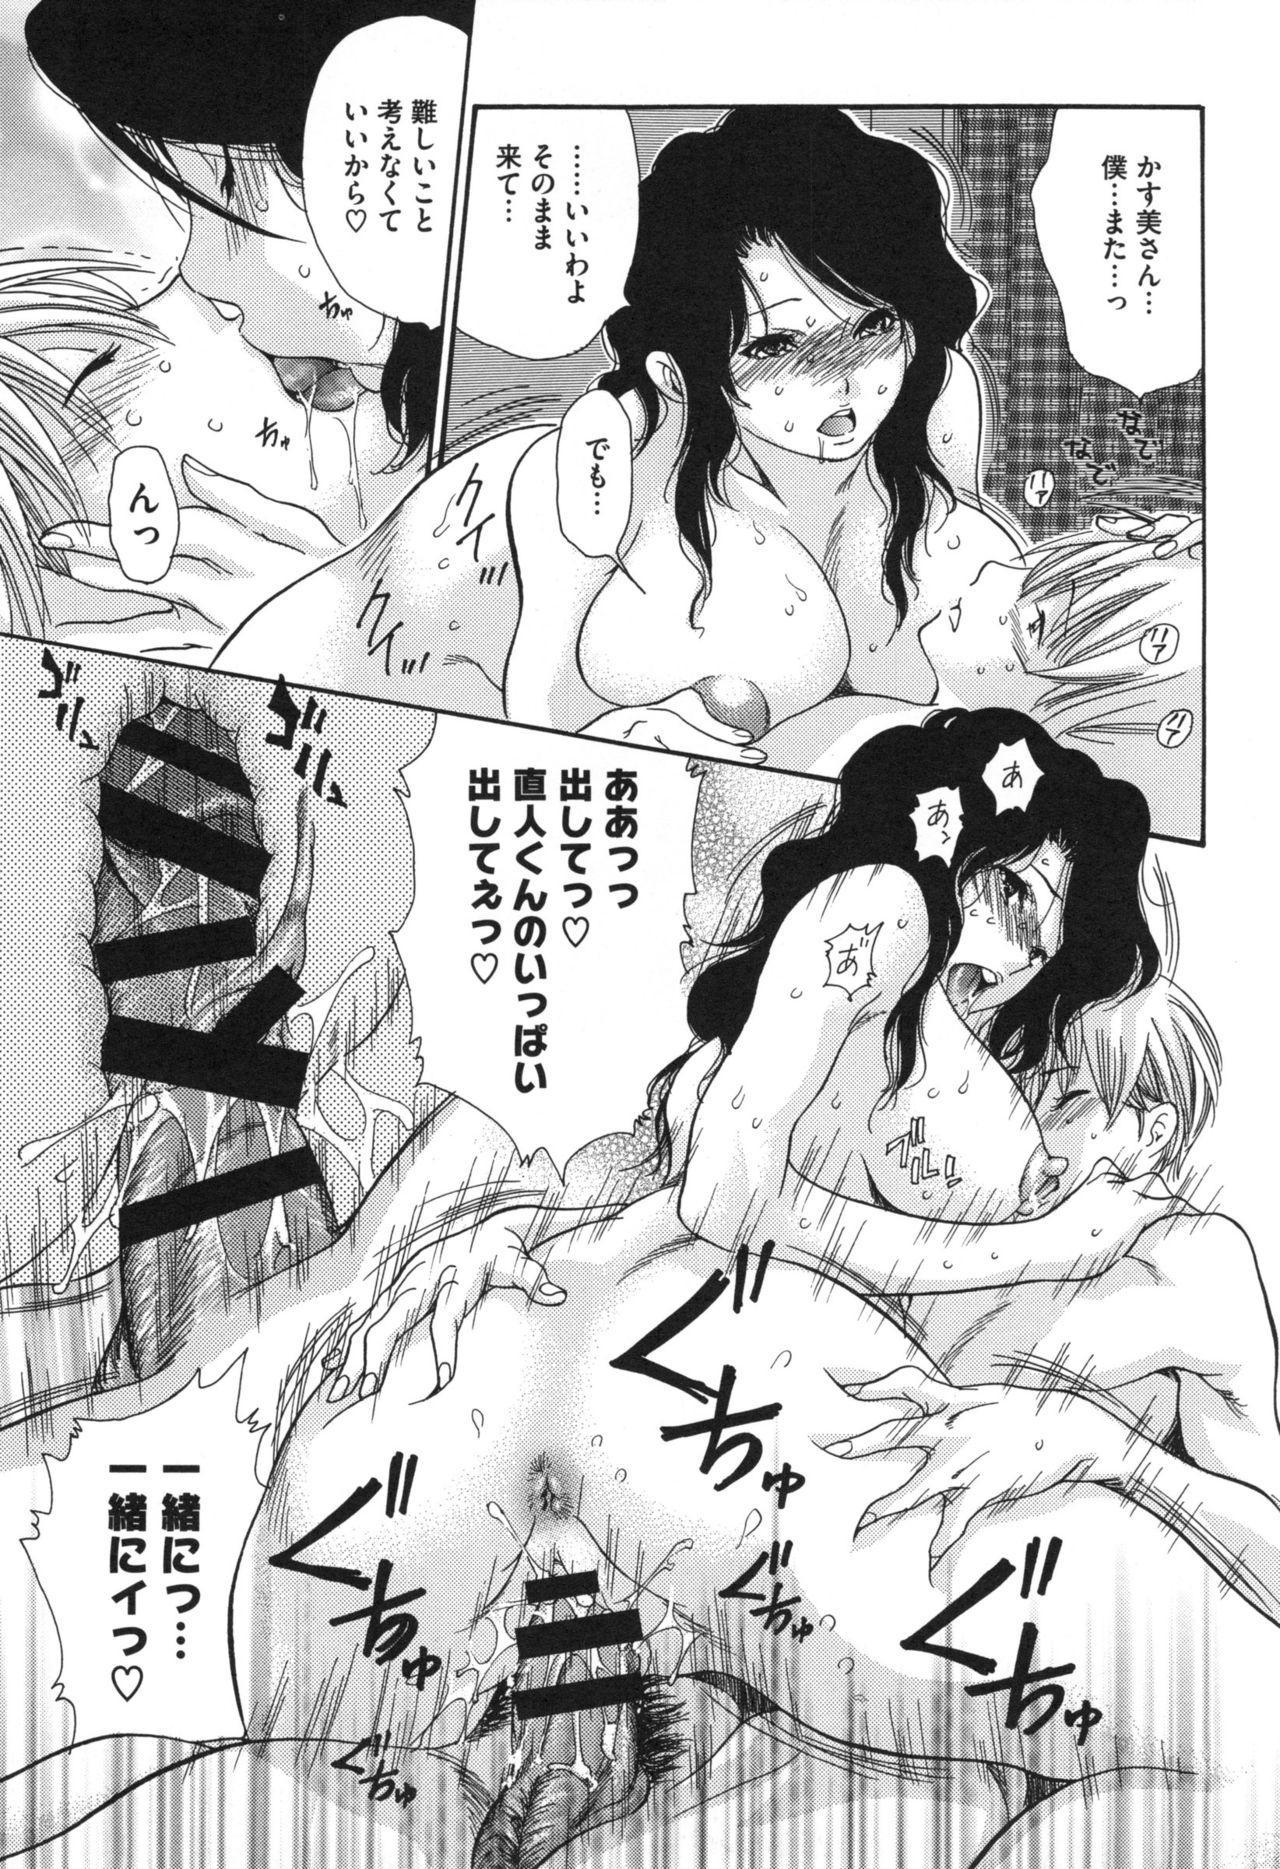 Niku-zuma Netorare Maniacs 87